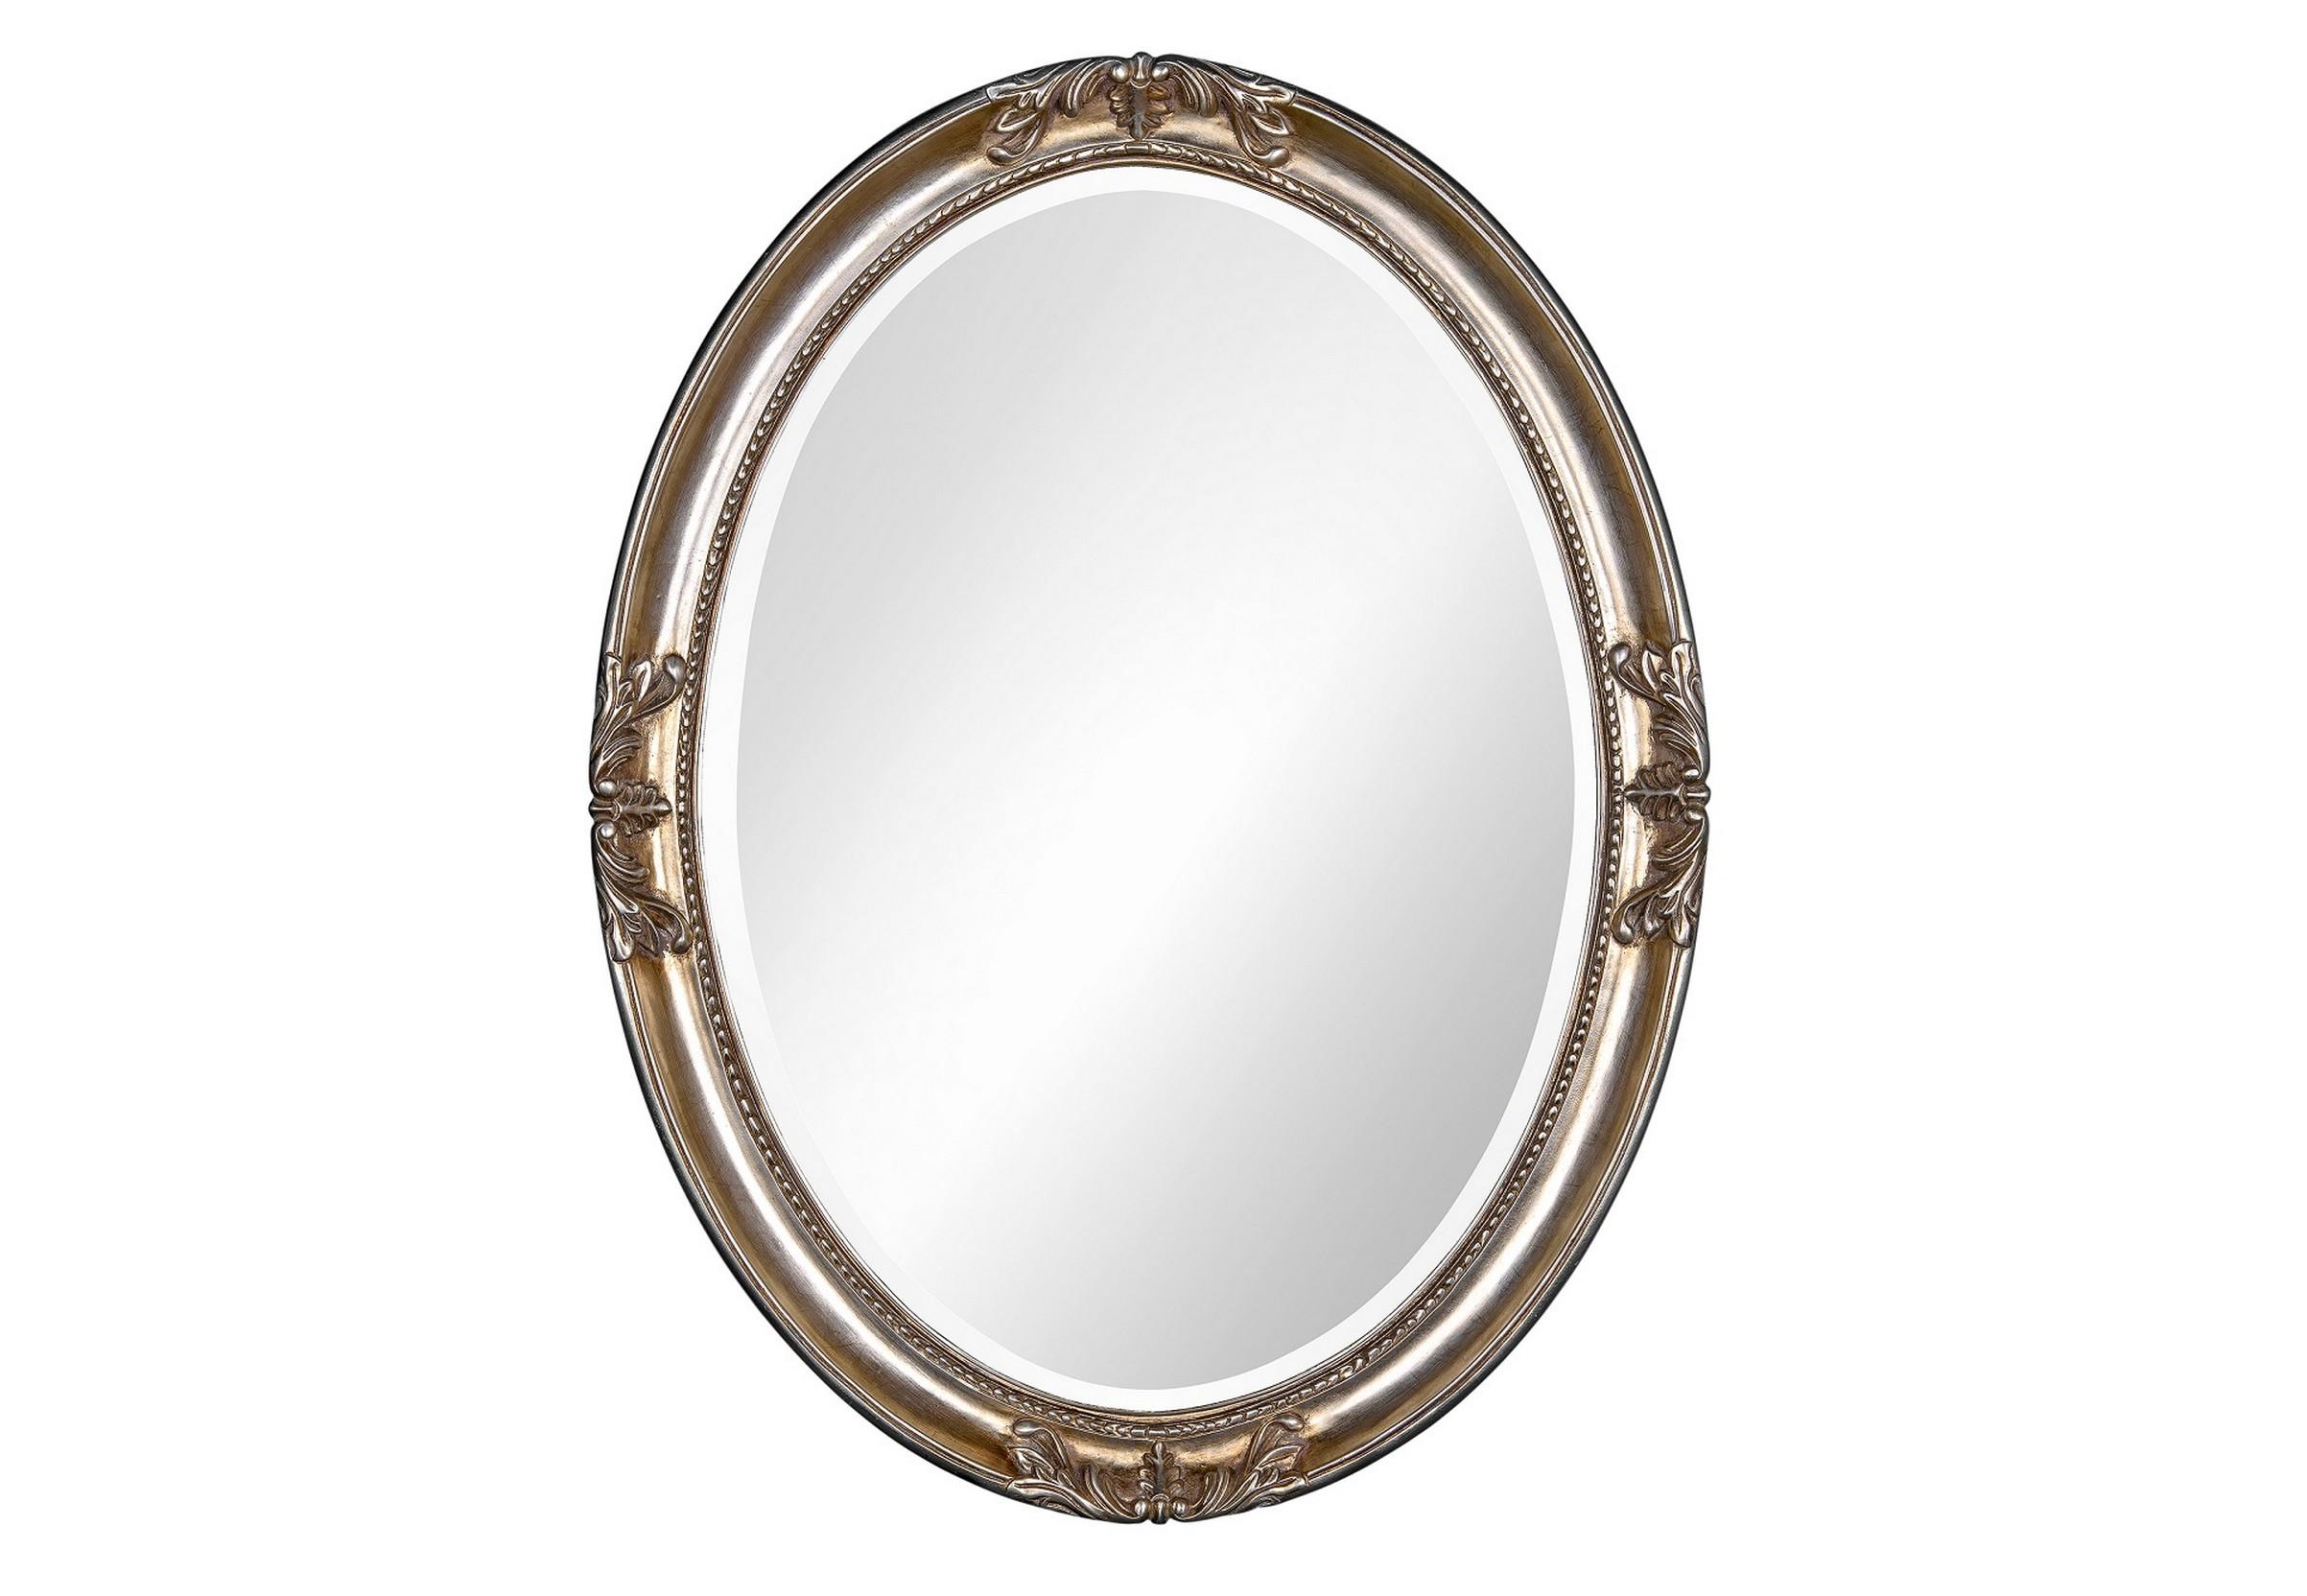 Зеркало Parigi SilverНастенные зеркала<br>Цвет: античное серебро<br><br>Material: Пластик<br>Length см: None<br>Width см: 62<br>Depth см: None<br>Height см: 82<br>Diameter см: None